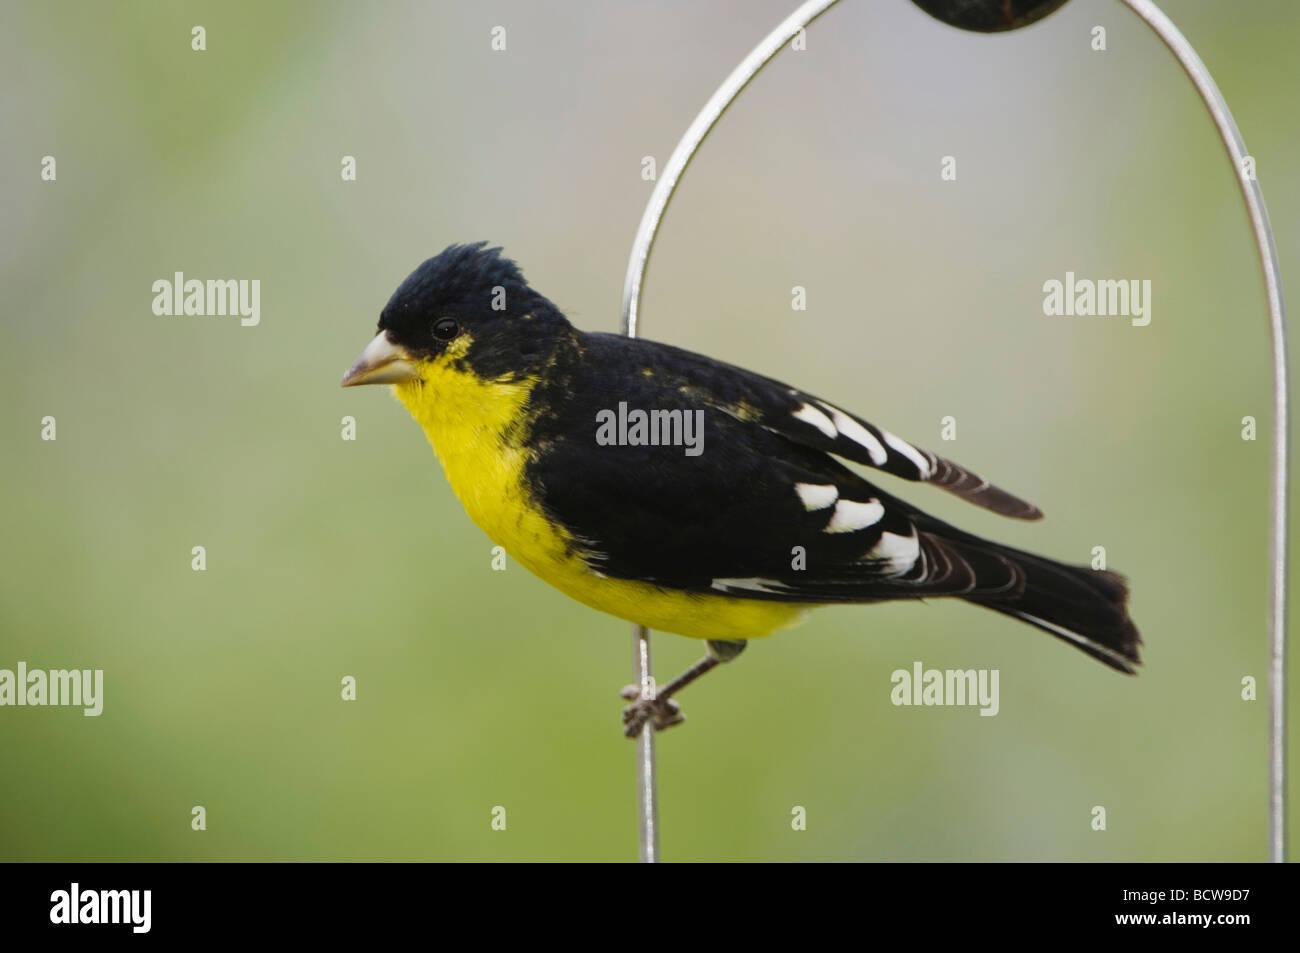 credit conservation thistle tube a york photo bird cc choosing audubon feeders likeaduck feeder flickr new